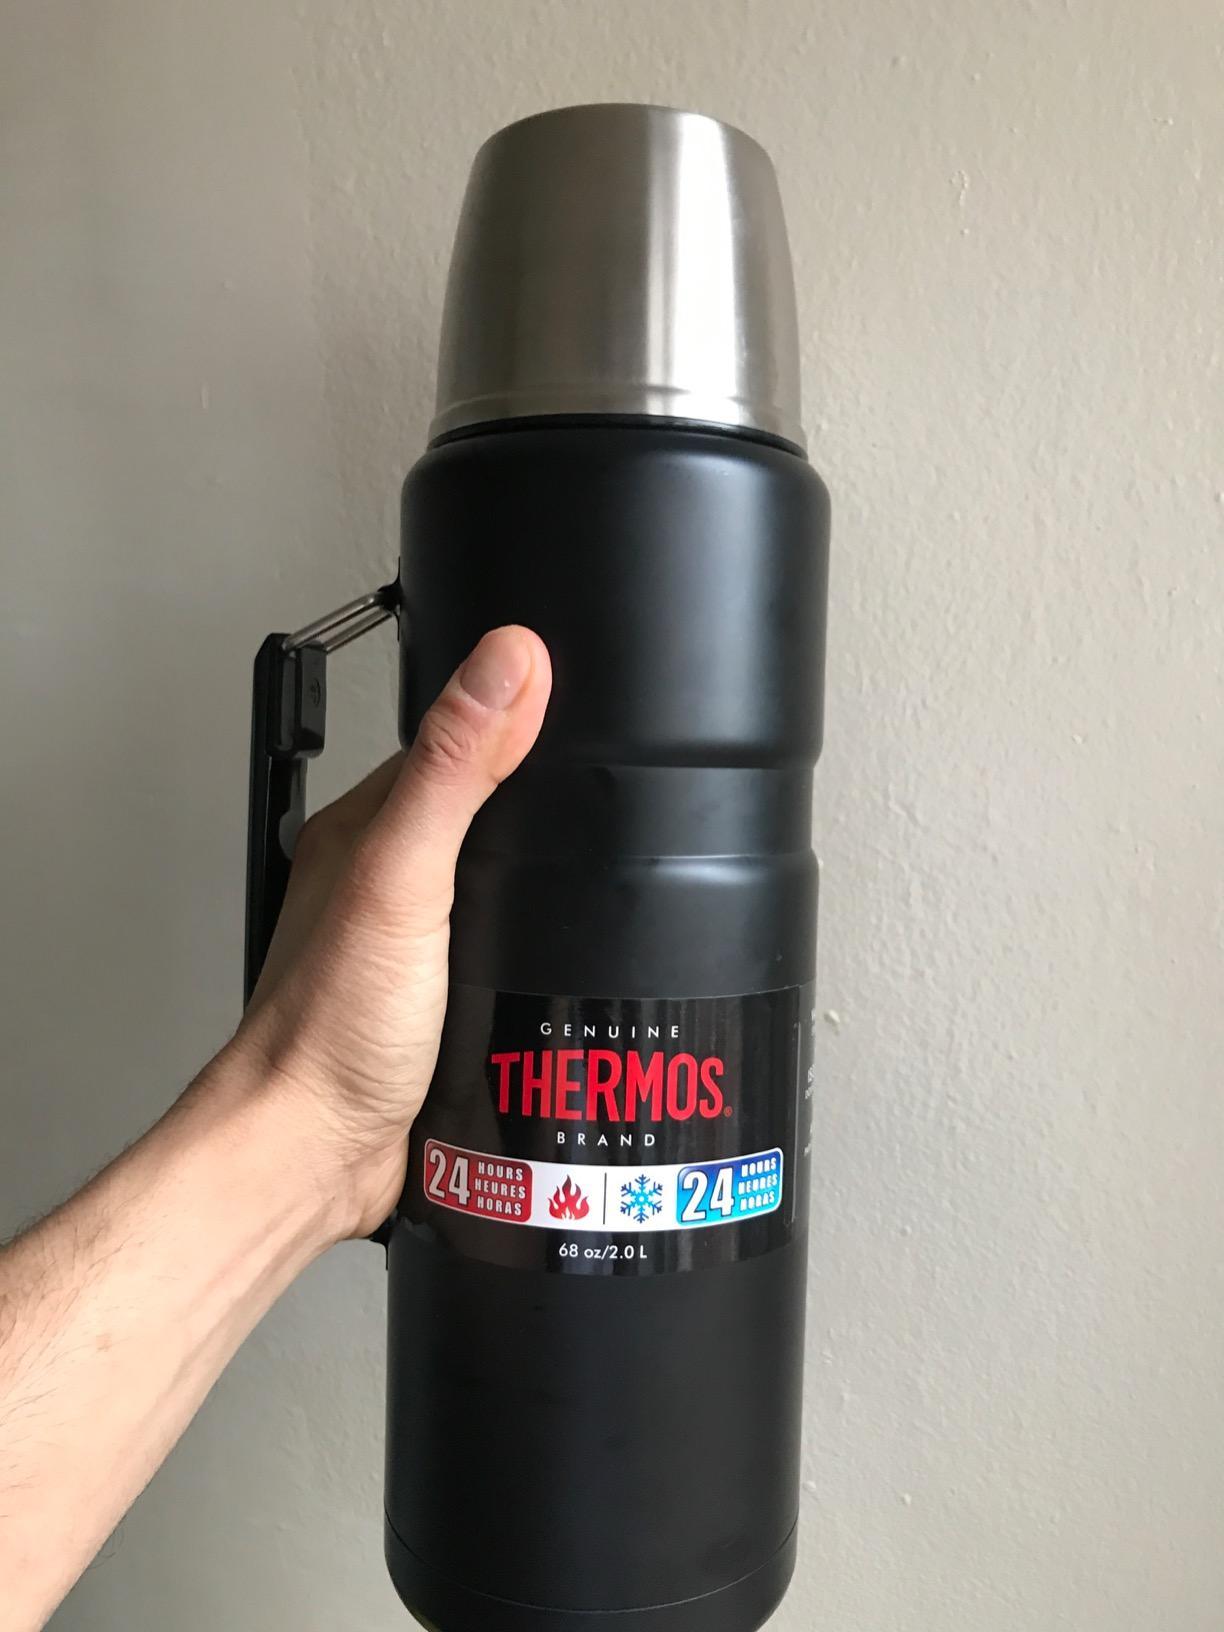 Thermos 膳魔师 King 帝王系列 2升 不锈钢保温瓶 5.6折$25.02 海淘转运到手约¥241